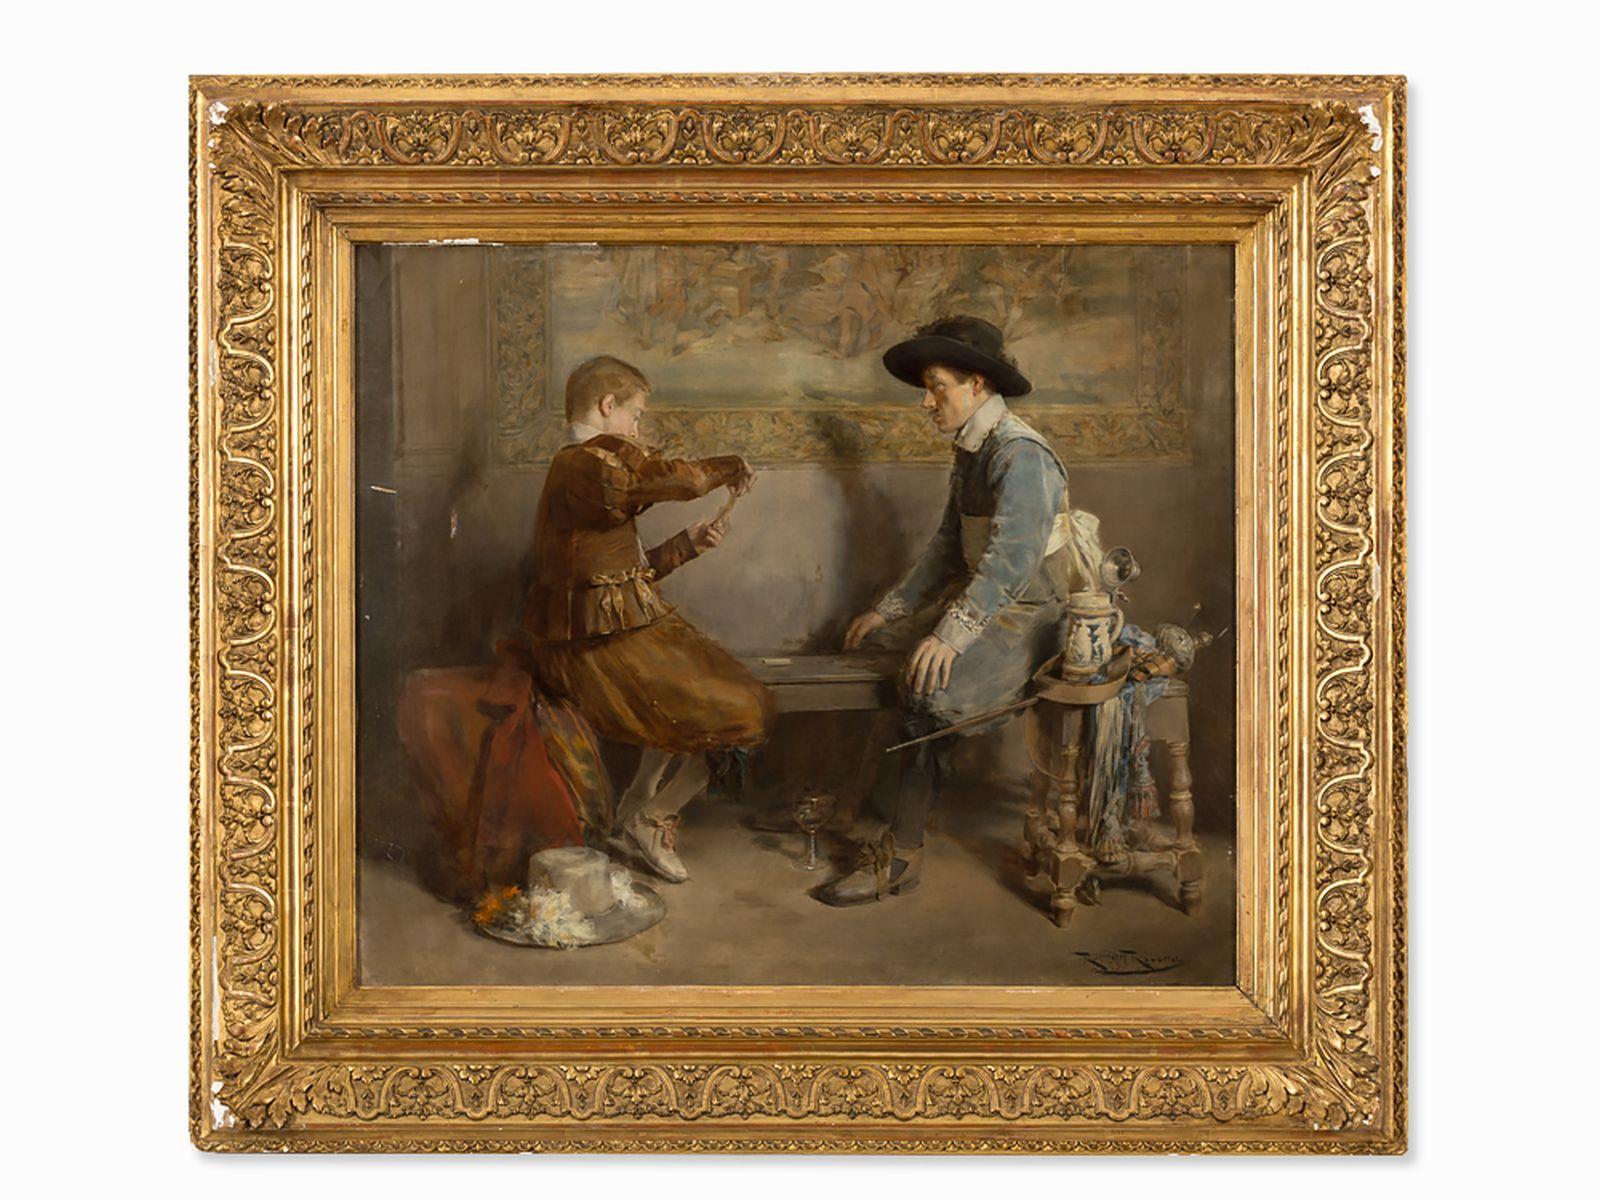 #37 Roman Ribera Cirera (1849-1935), Card Players, Oil, circa 1890 | Roman Ribera Cirera (1849-1935), Image